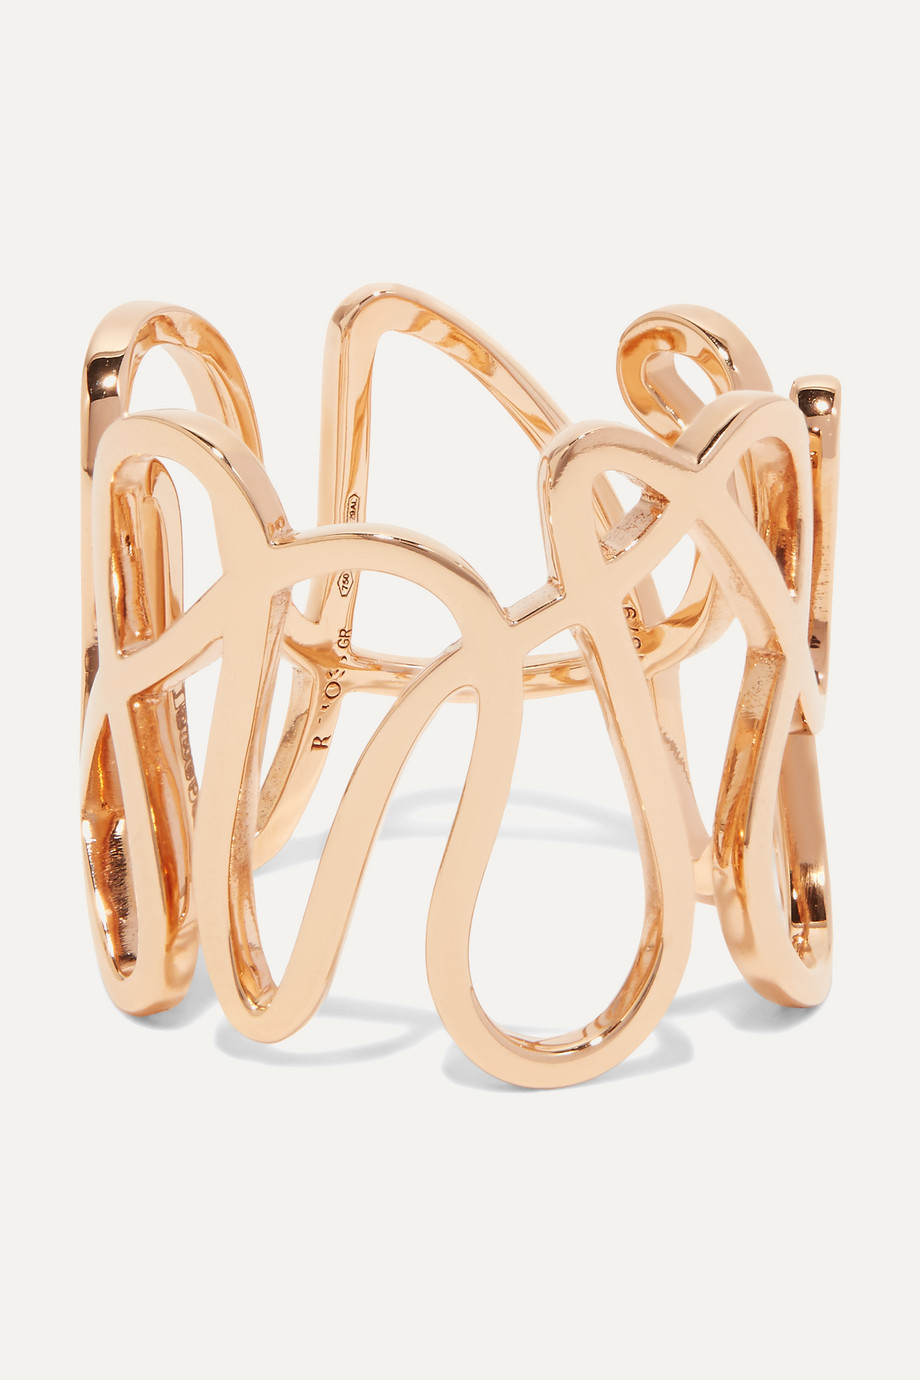 Repossi White Noise 18-karat rose gold ring